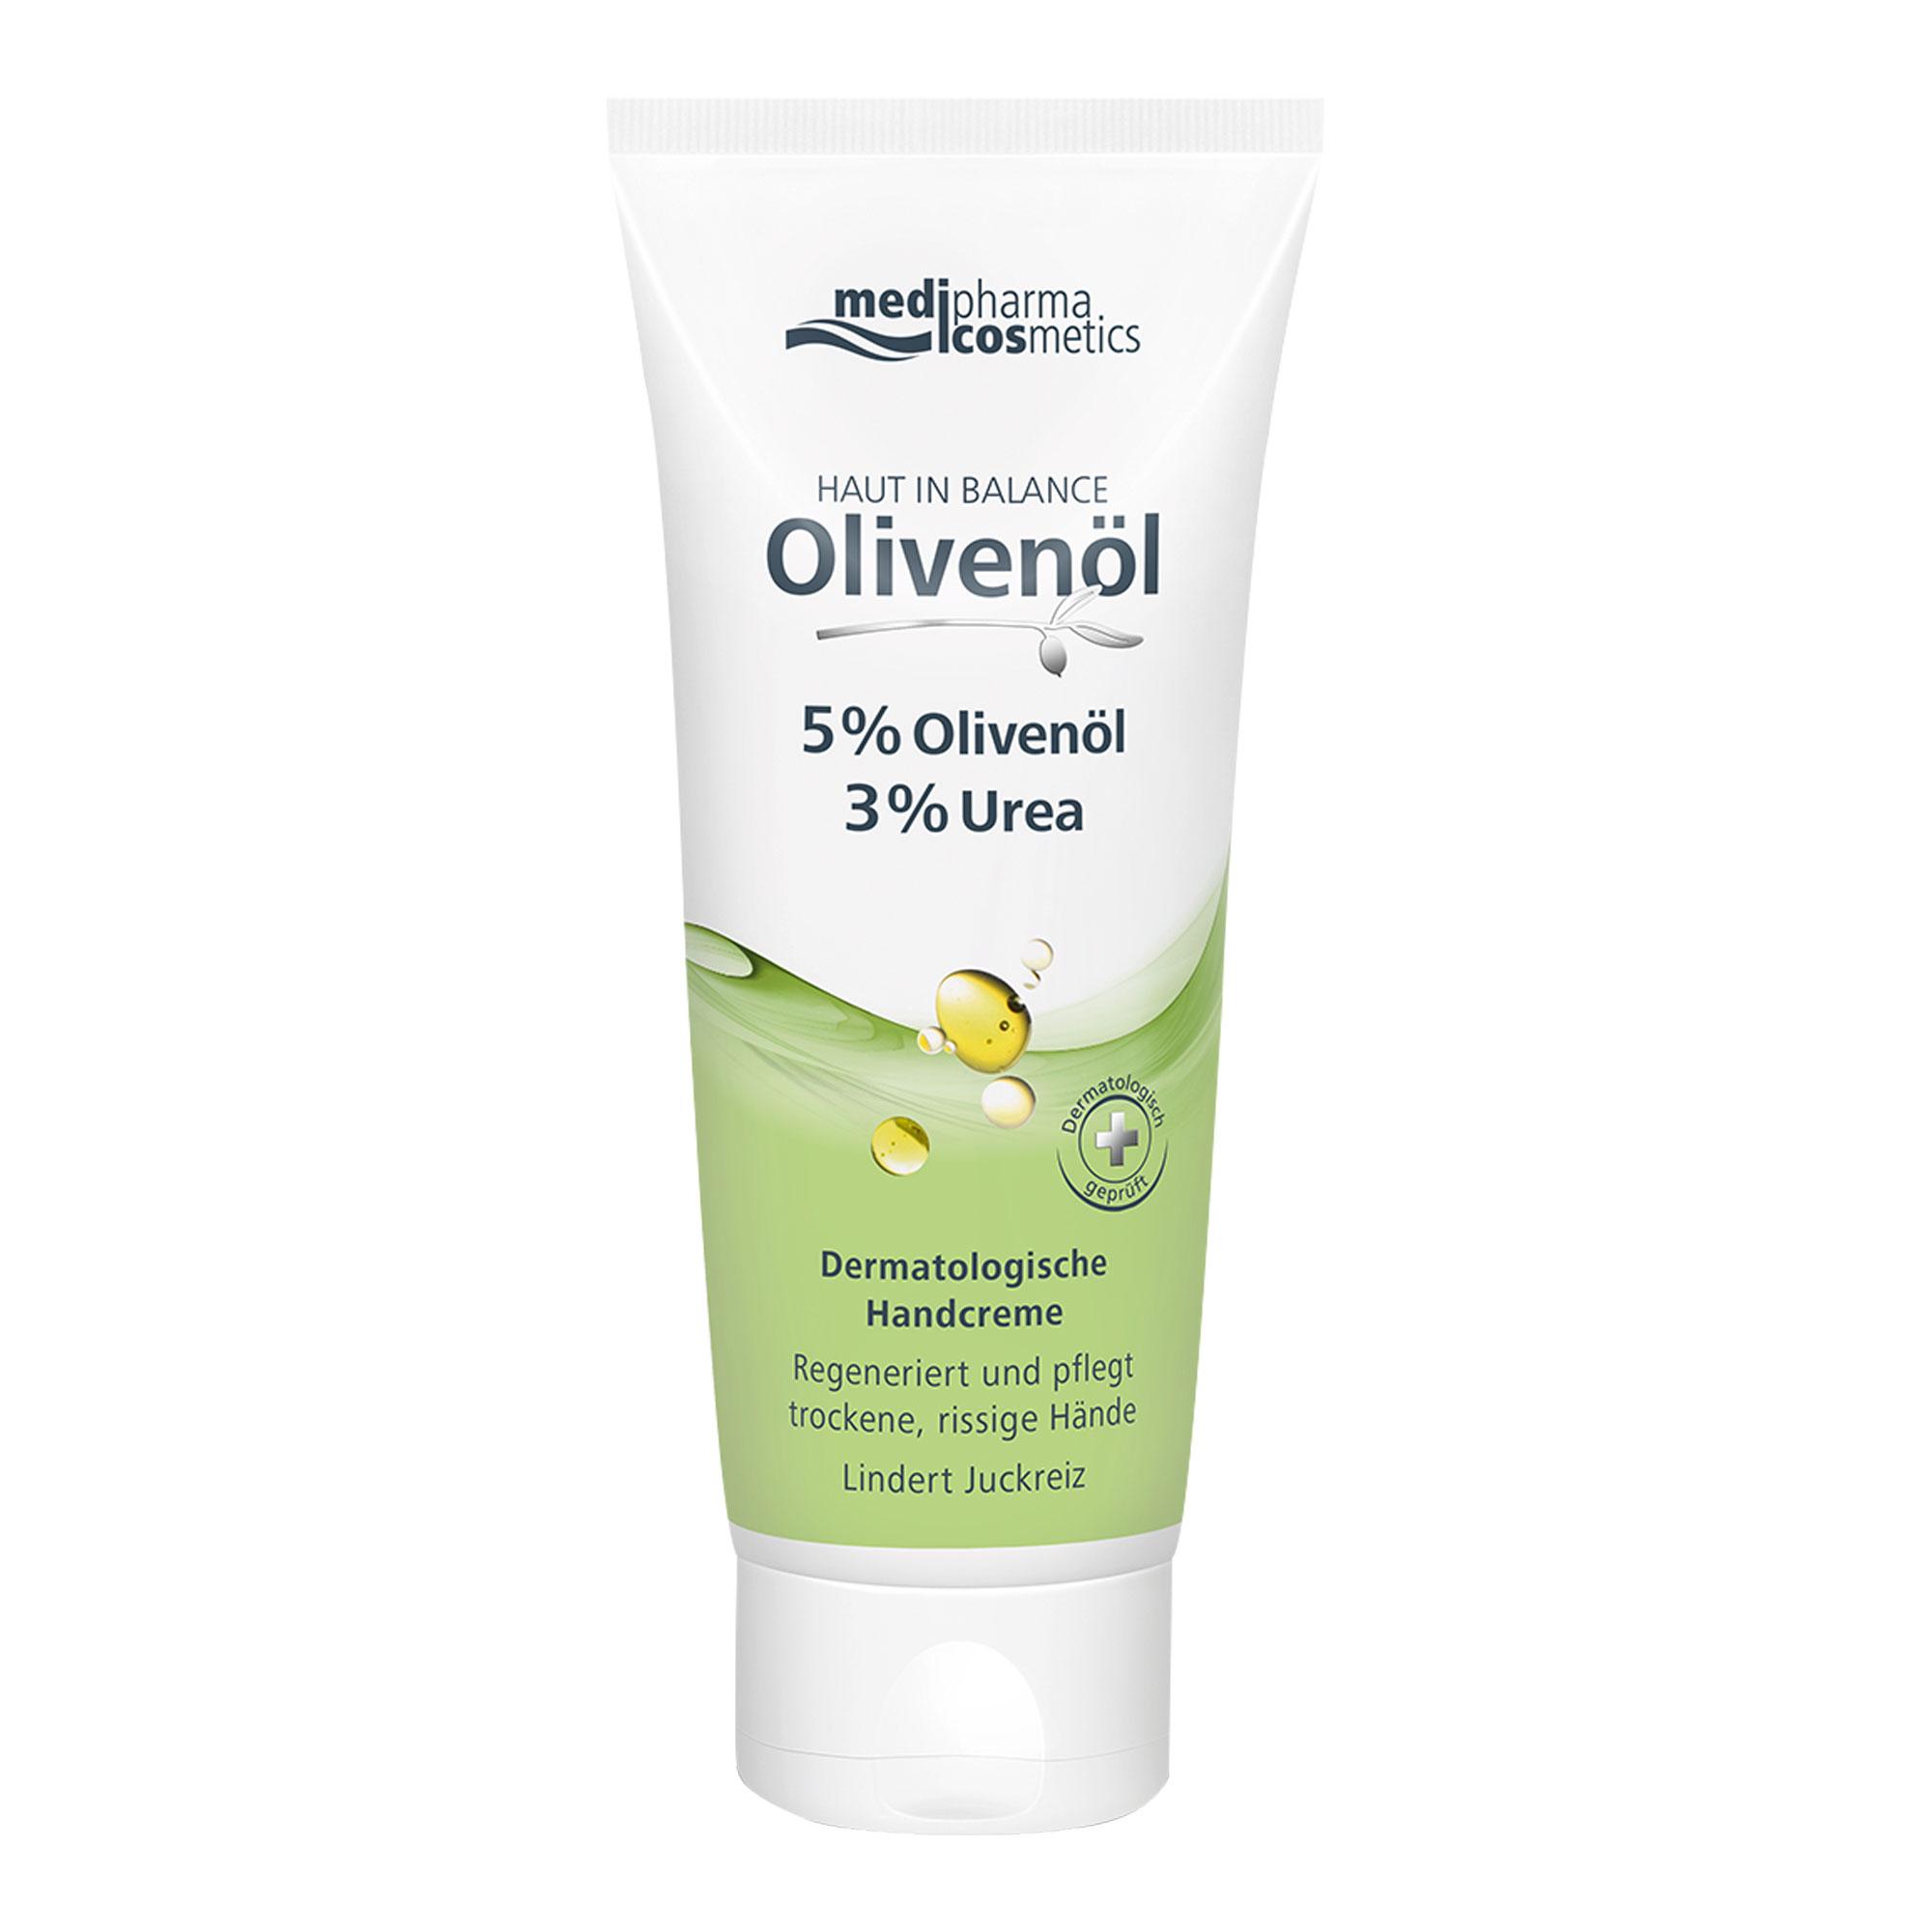 Olivenöl Haut in Balance Handcreme